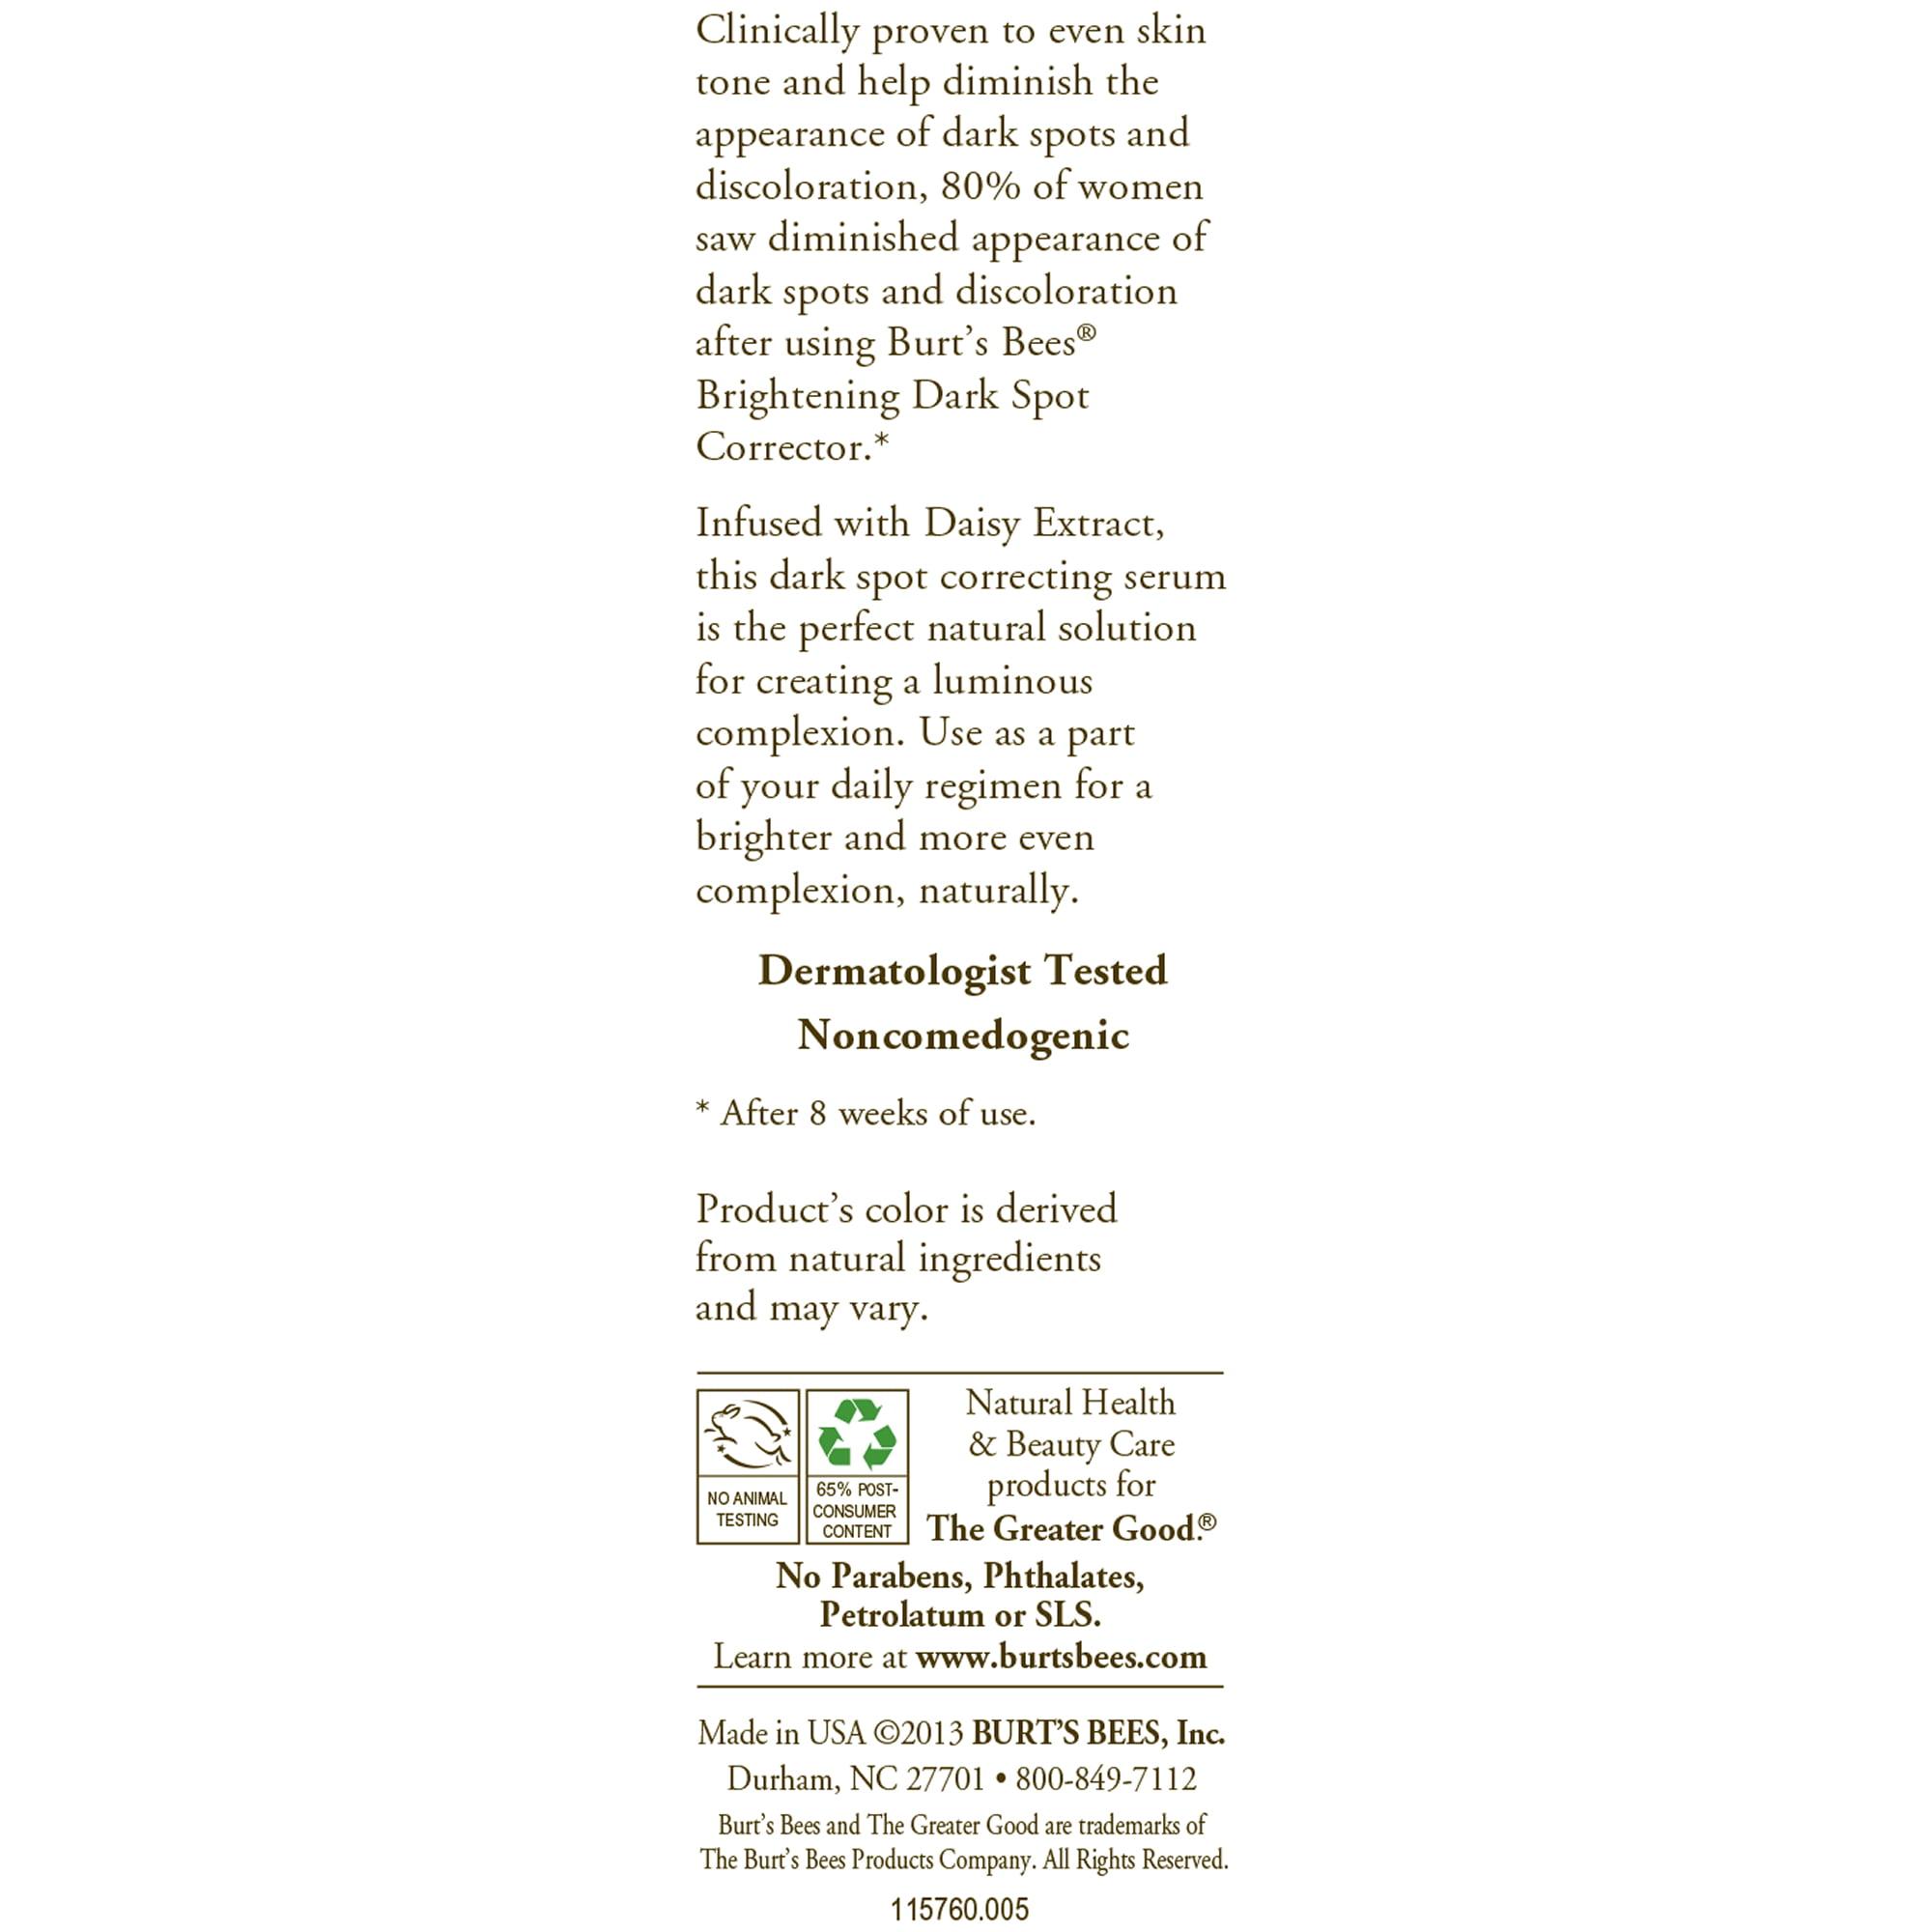 Dark spot corrector reviews by dermatologist - Dark Spot Corrector Reviews By Dermatologist 28